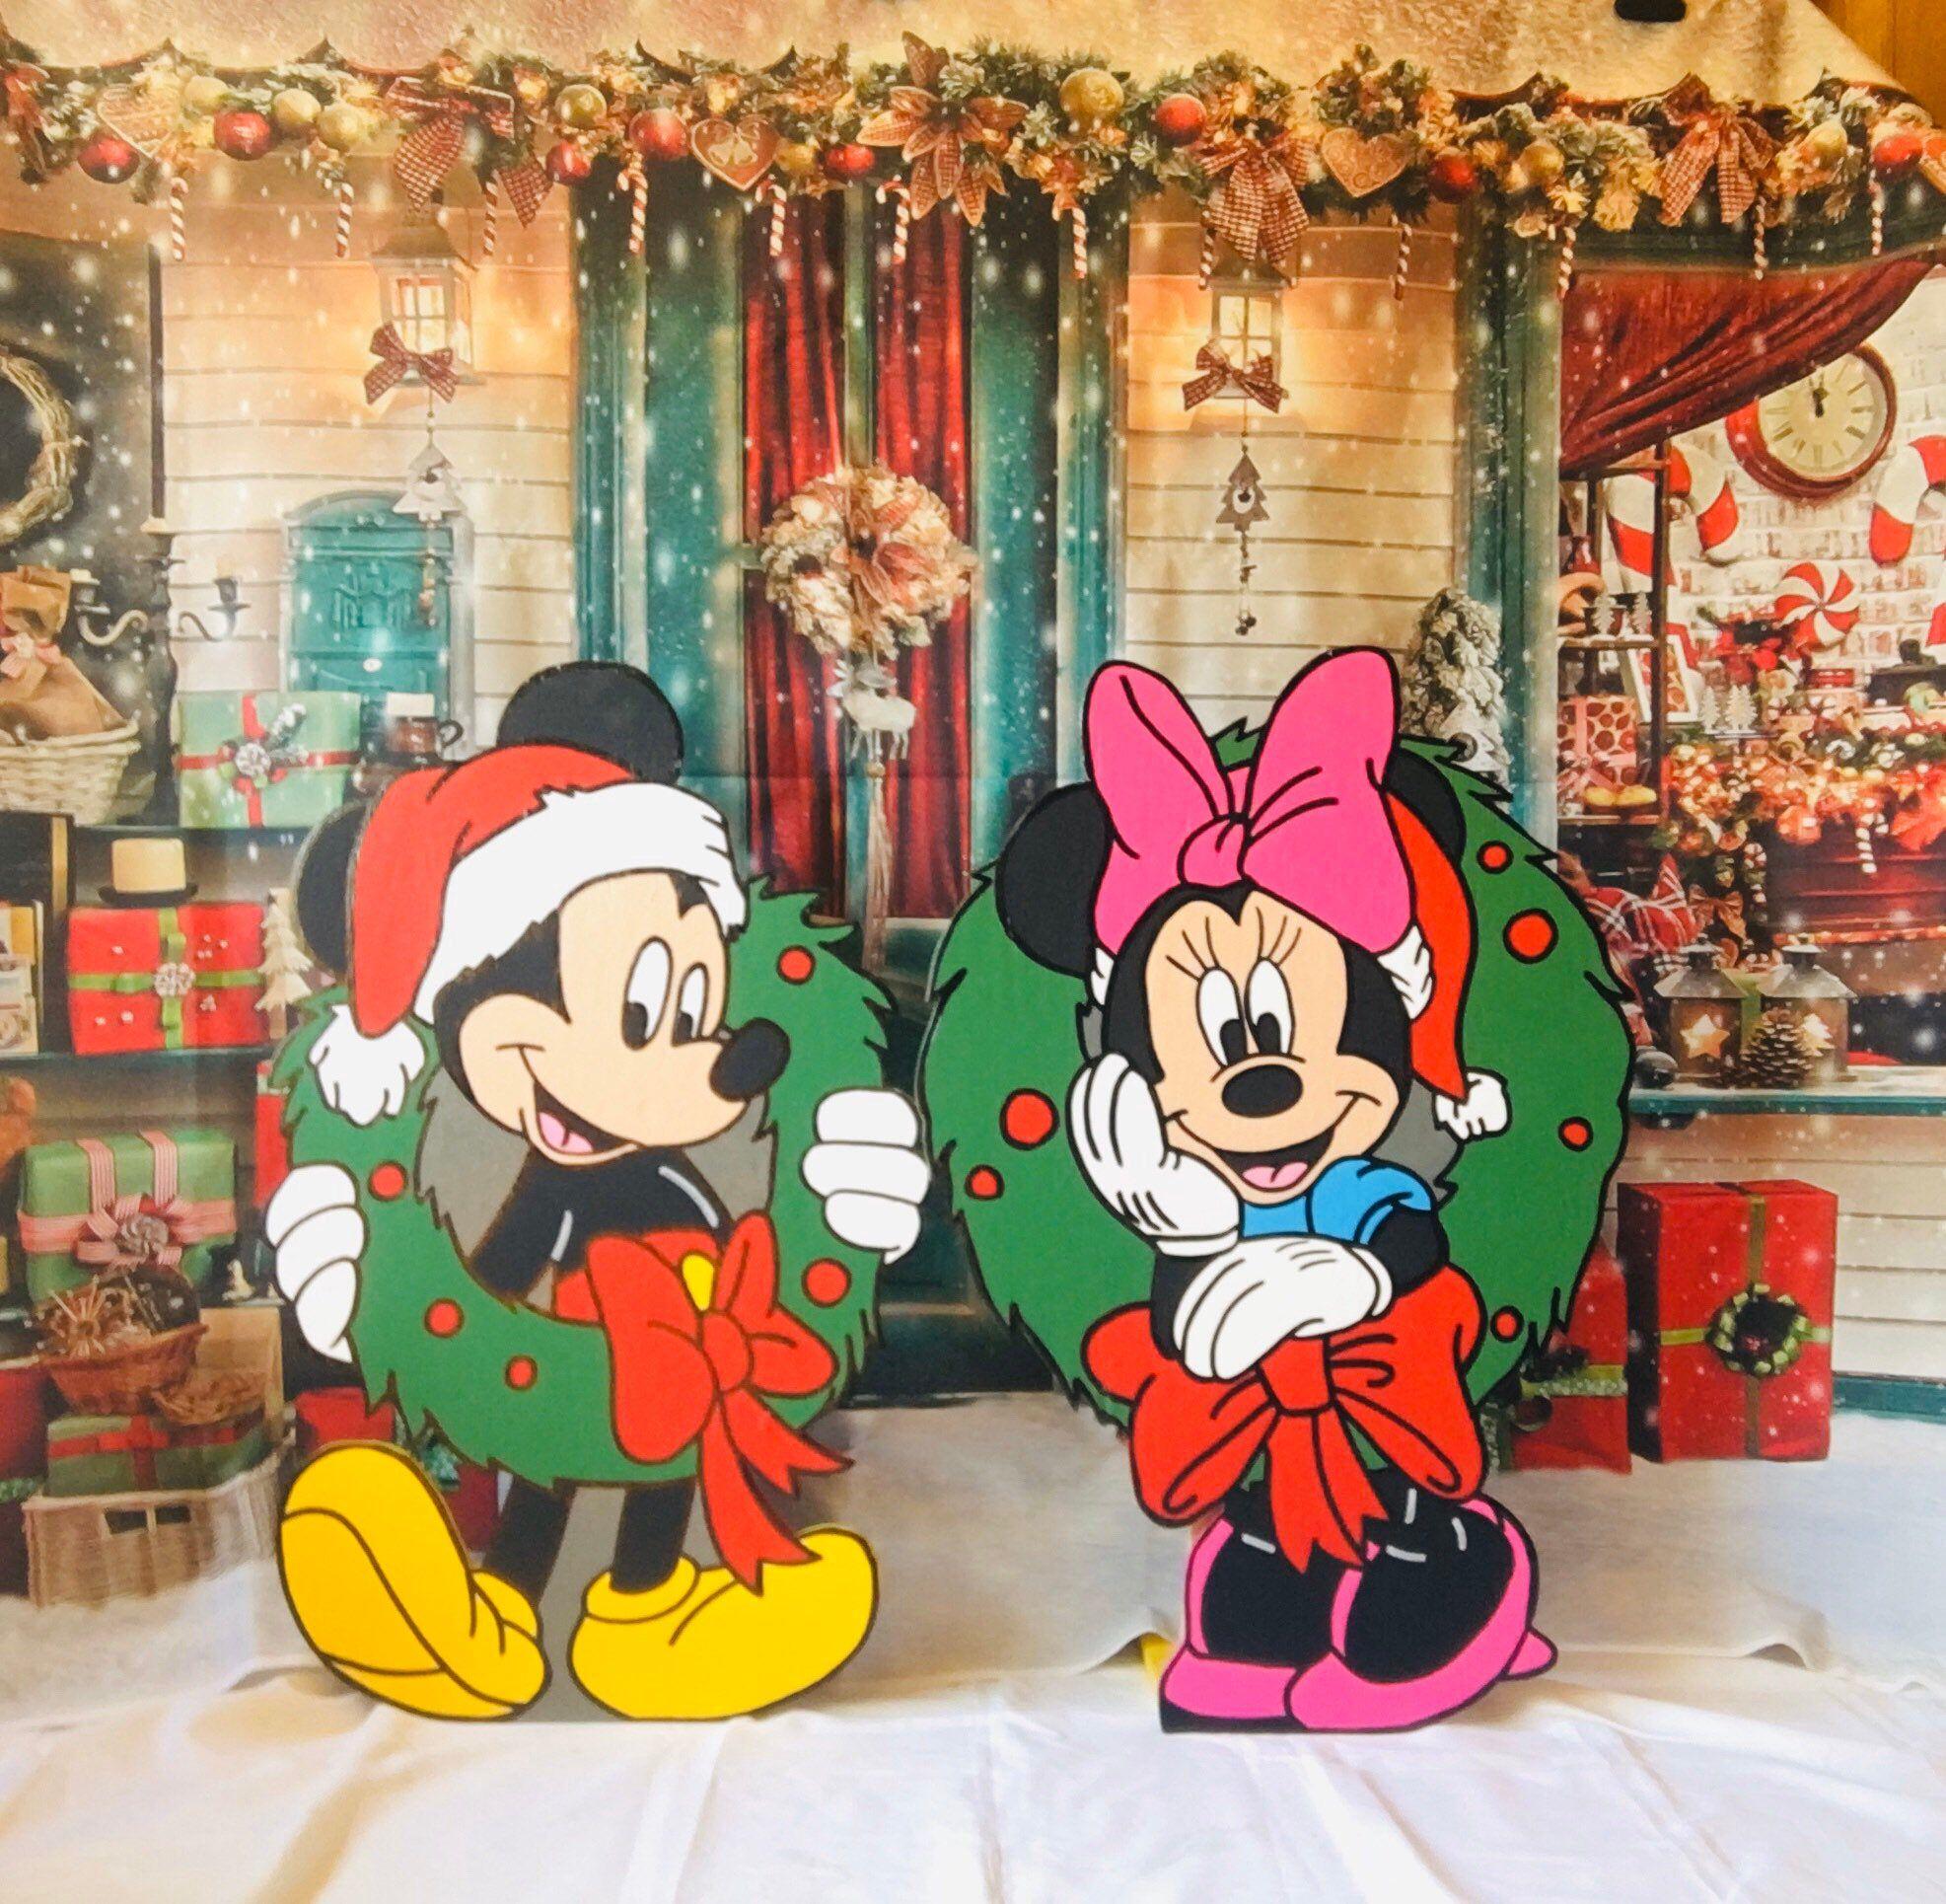 Disney Mickey And Minnie Christmas Yard Art Set Disney Yard Etsy Disney Christmas Decorations Christmas Yard Art Minnie Christmas